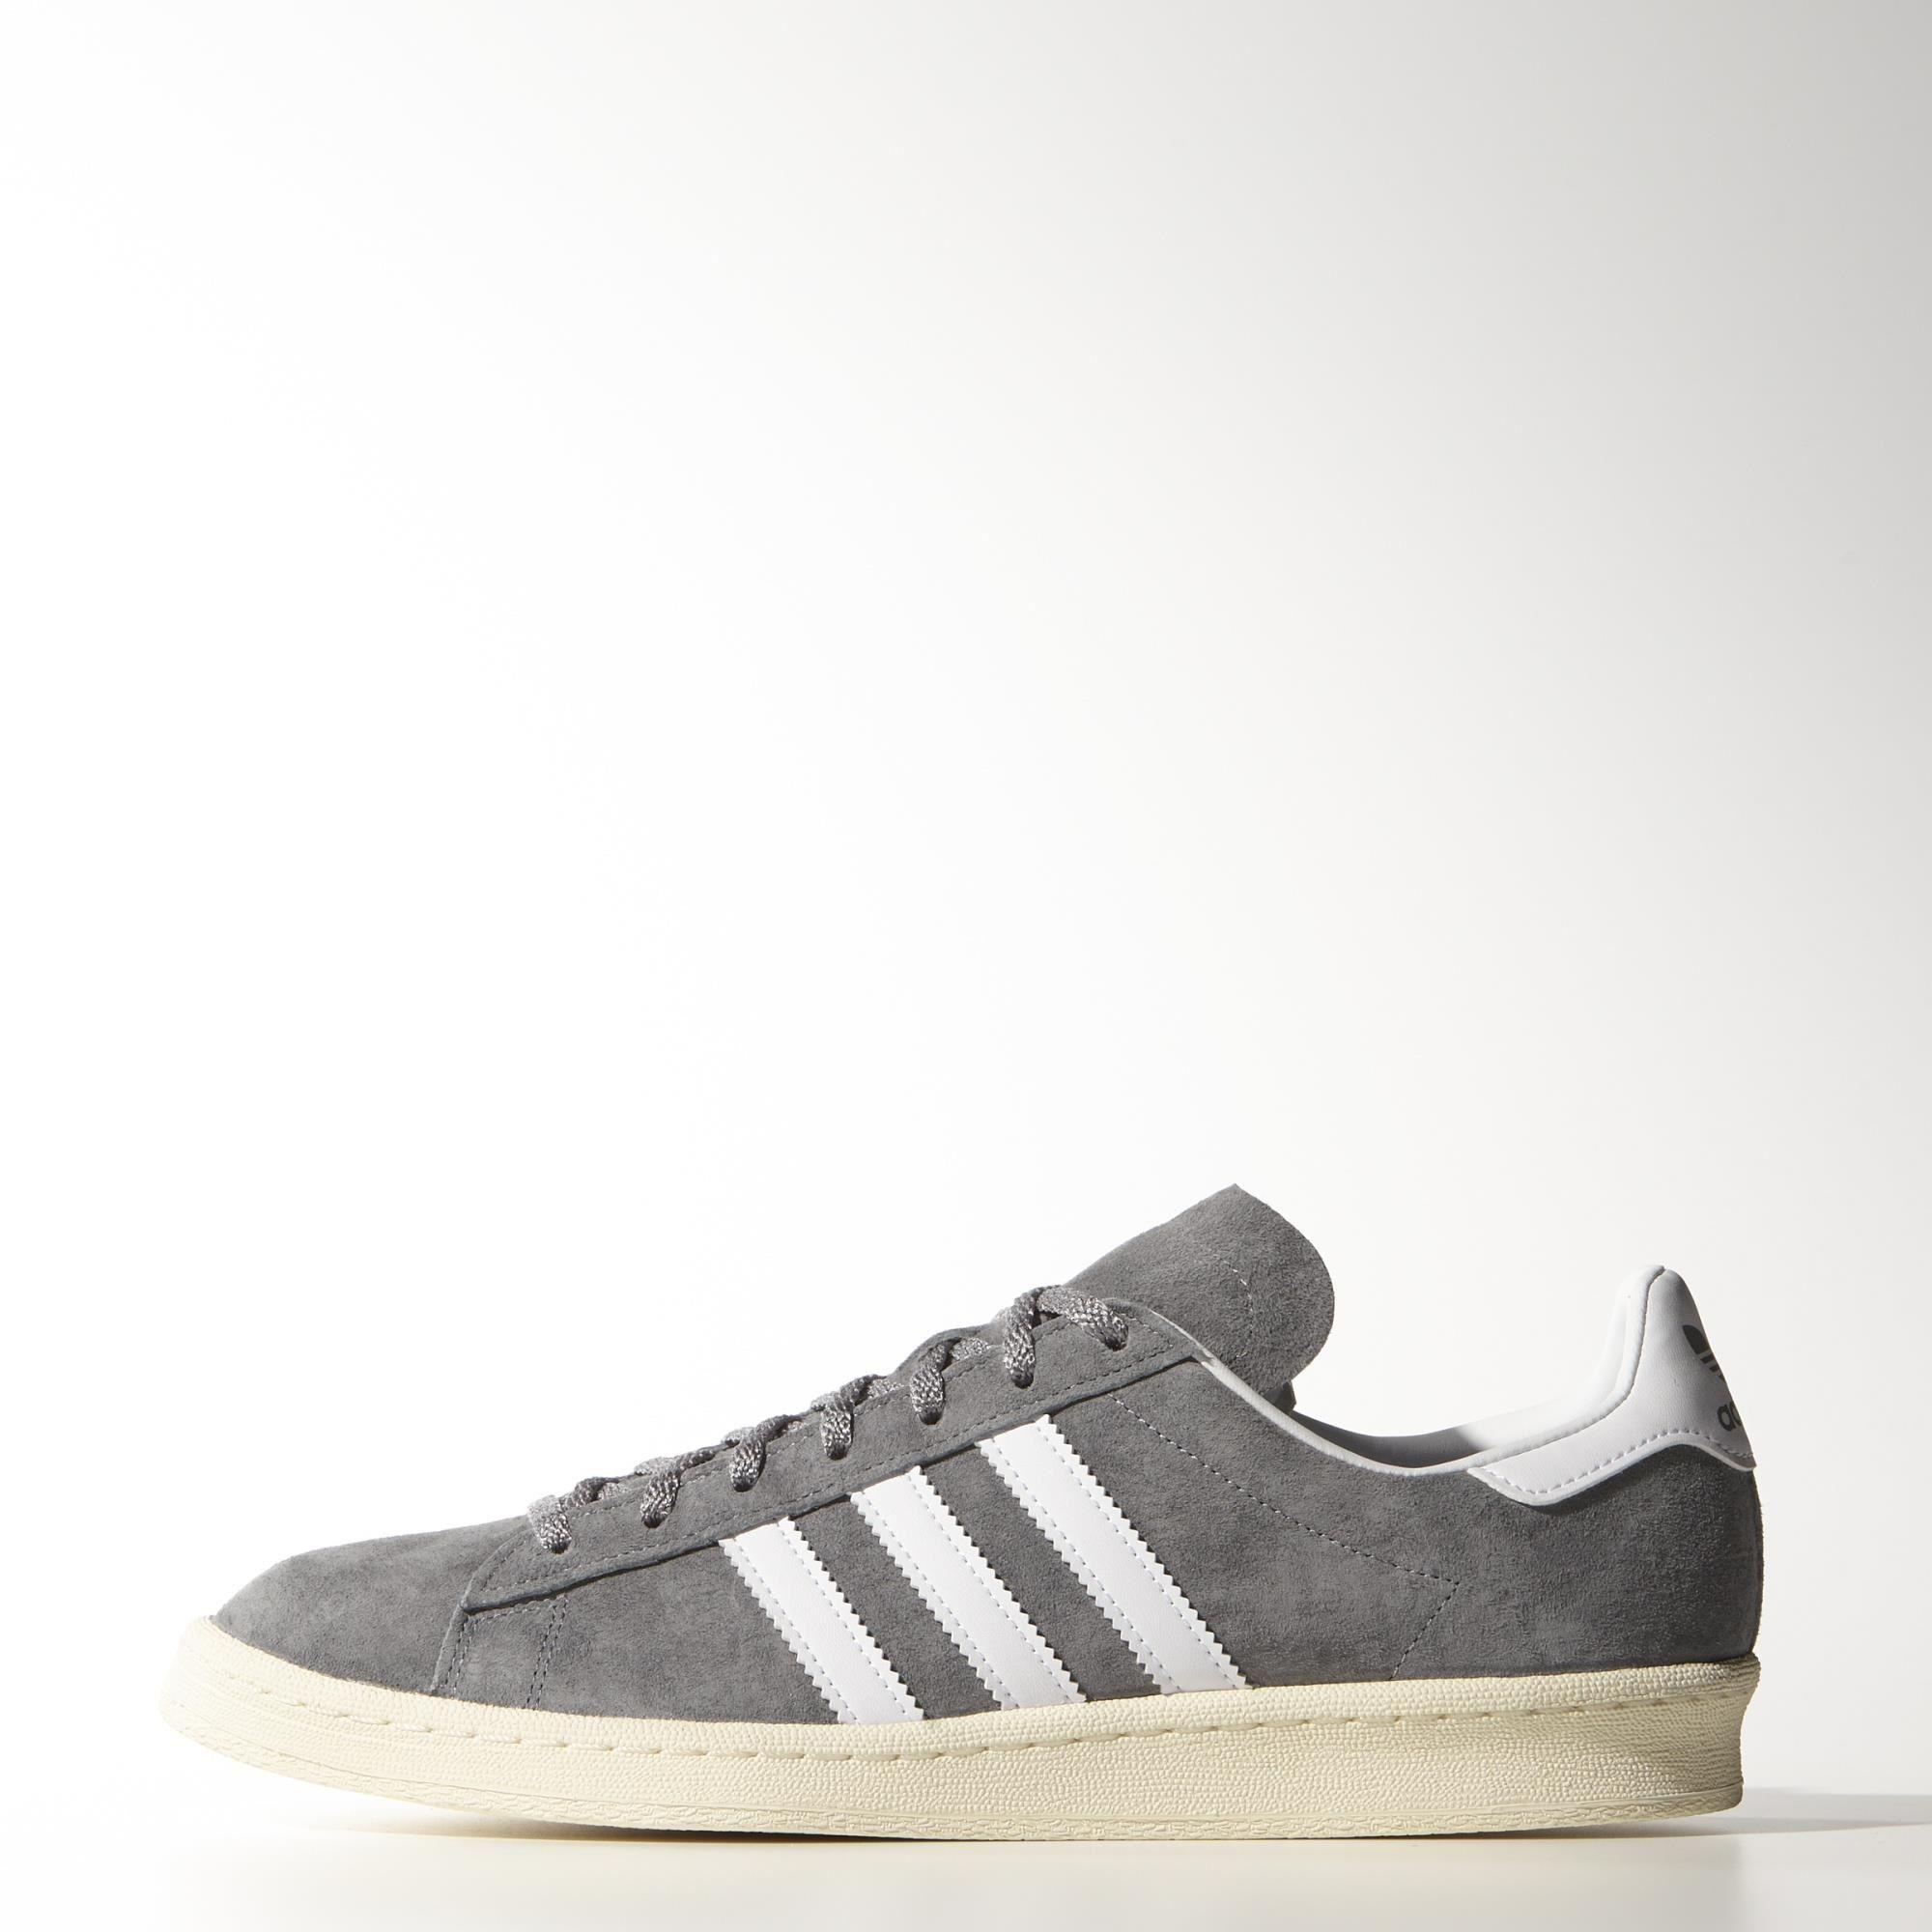 Adidas Nigo Campus | Staple sneakers